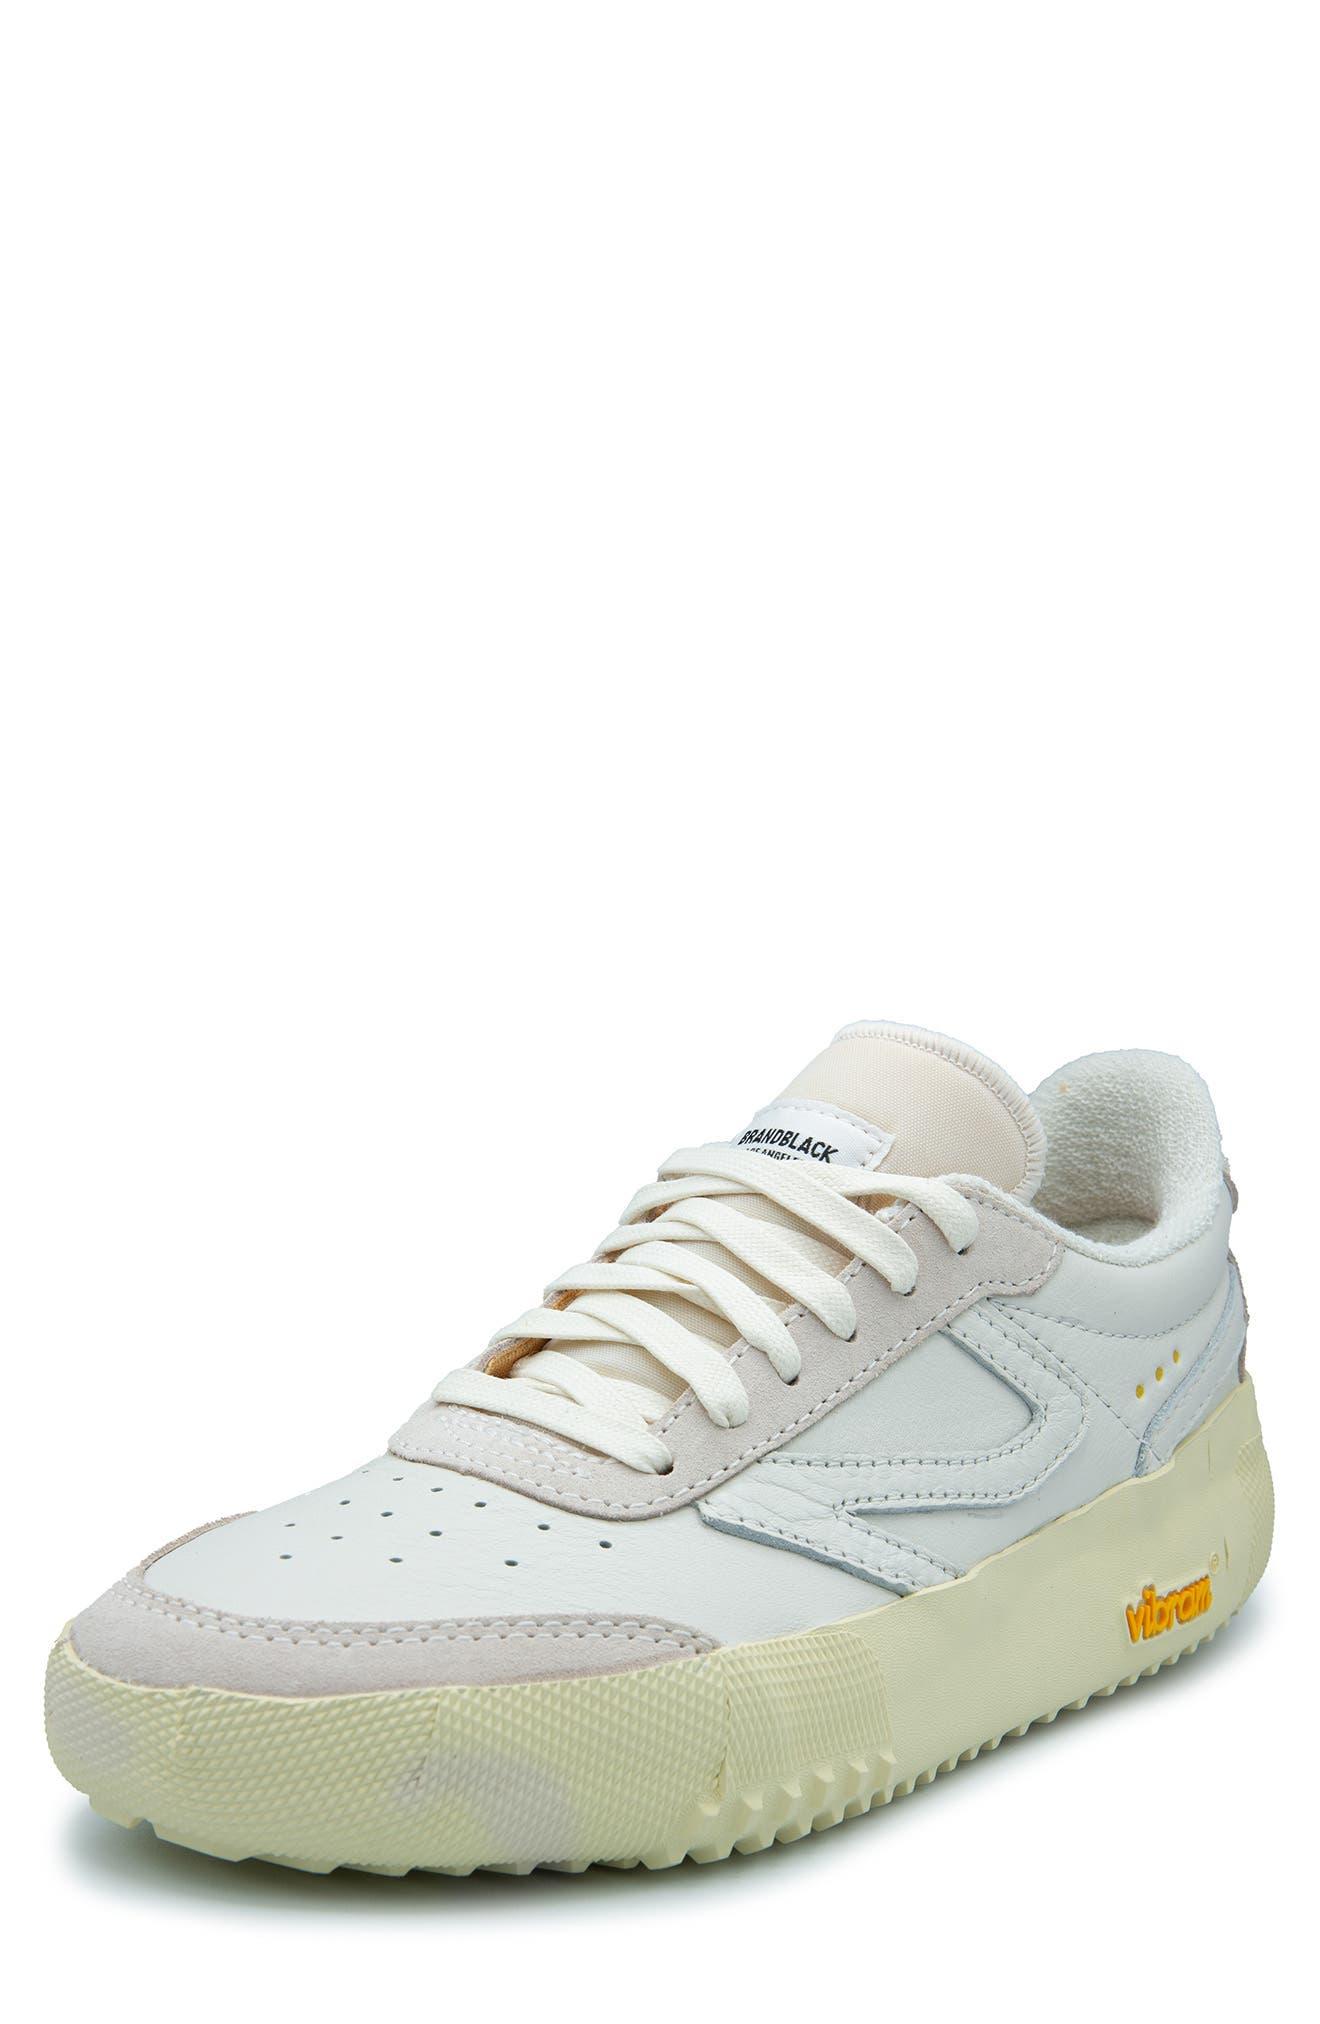 Vista Platform Sneaker